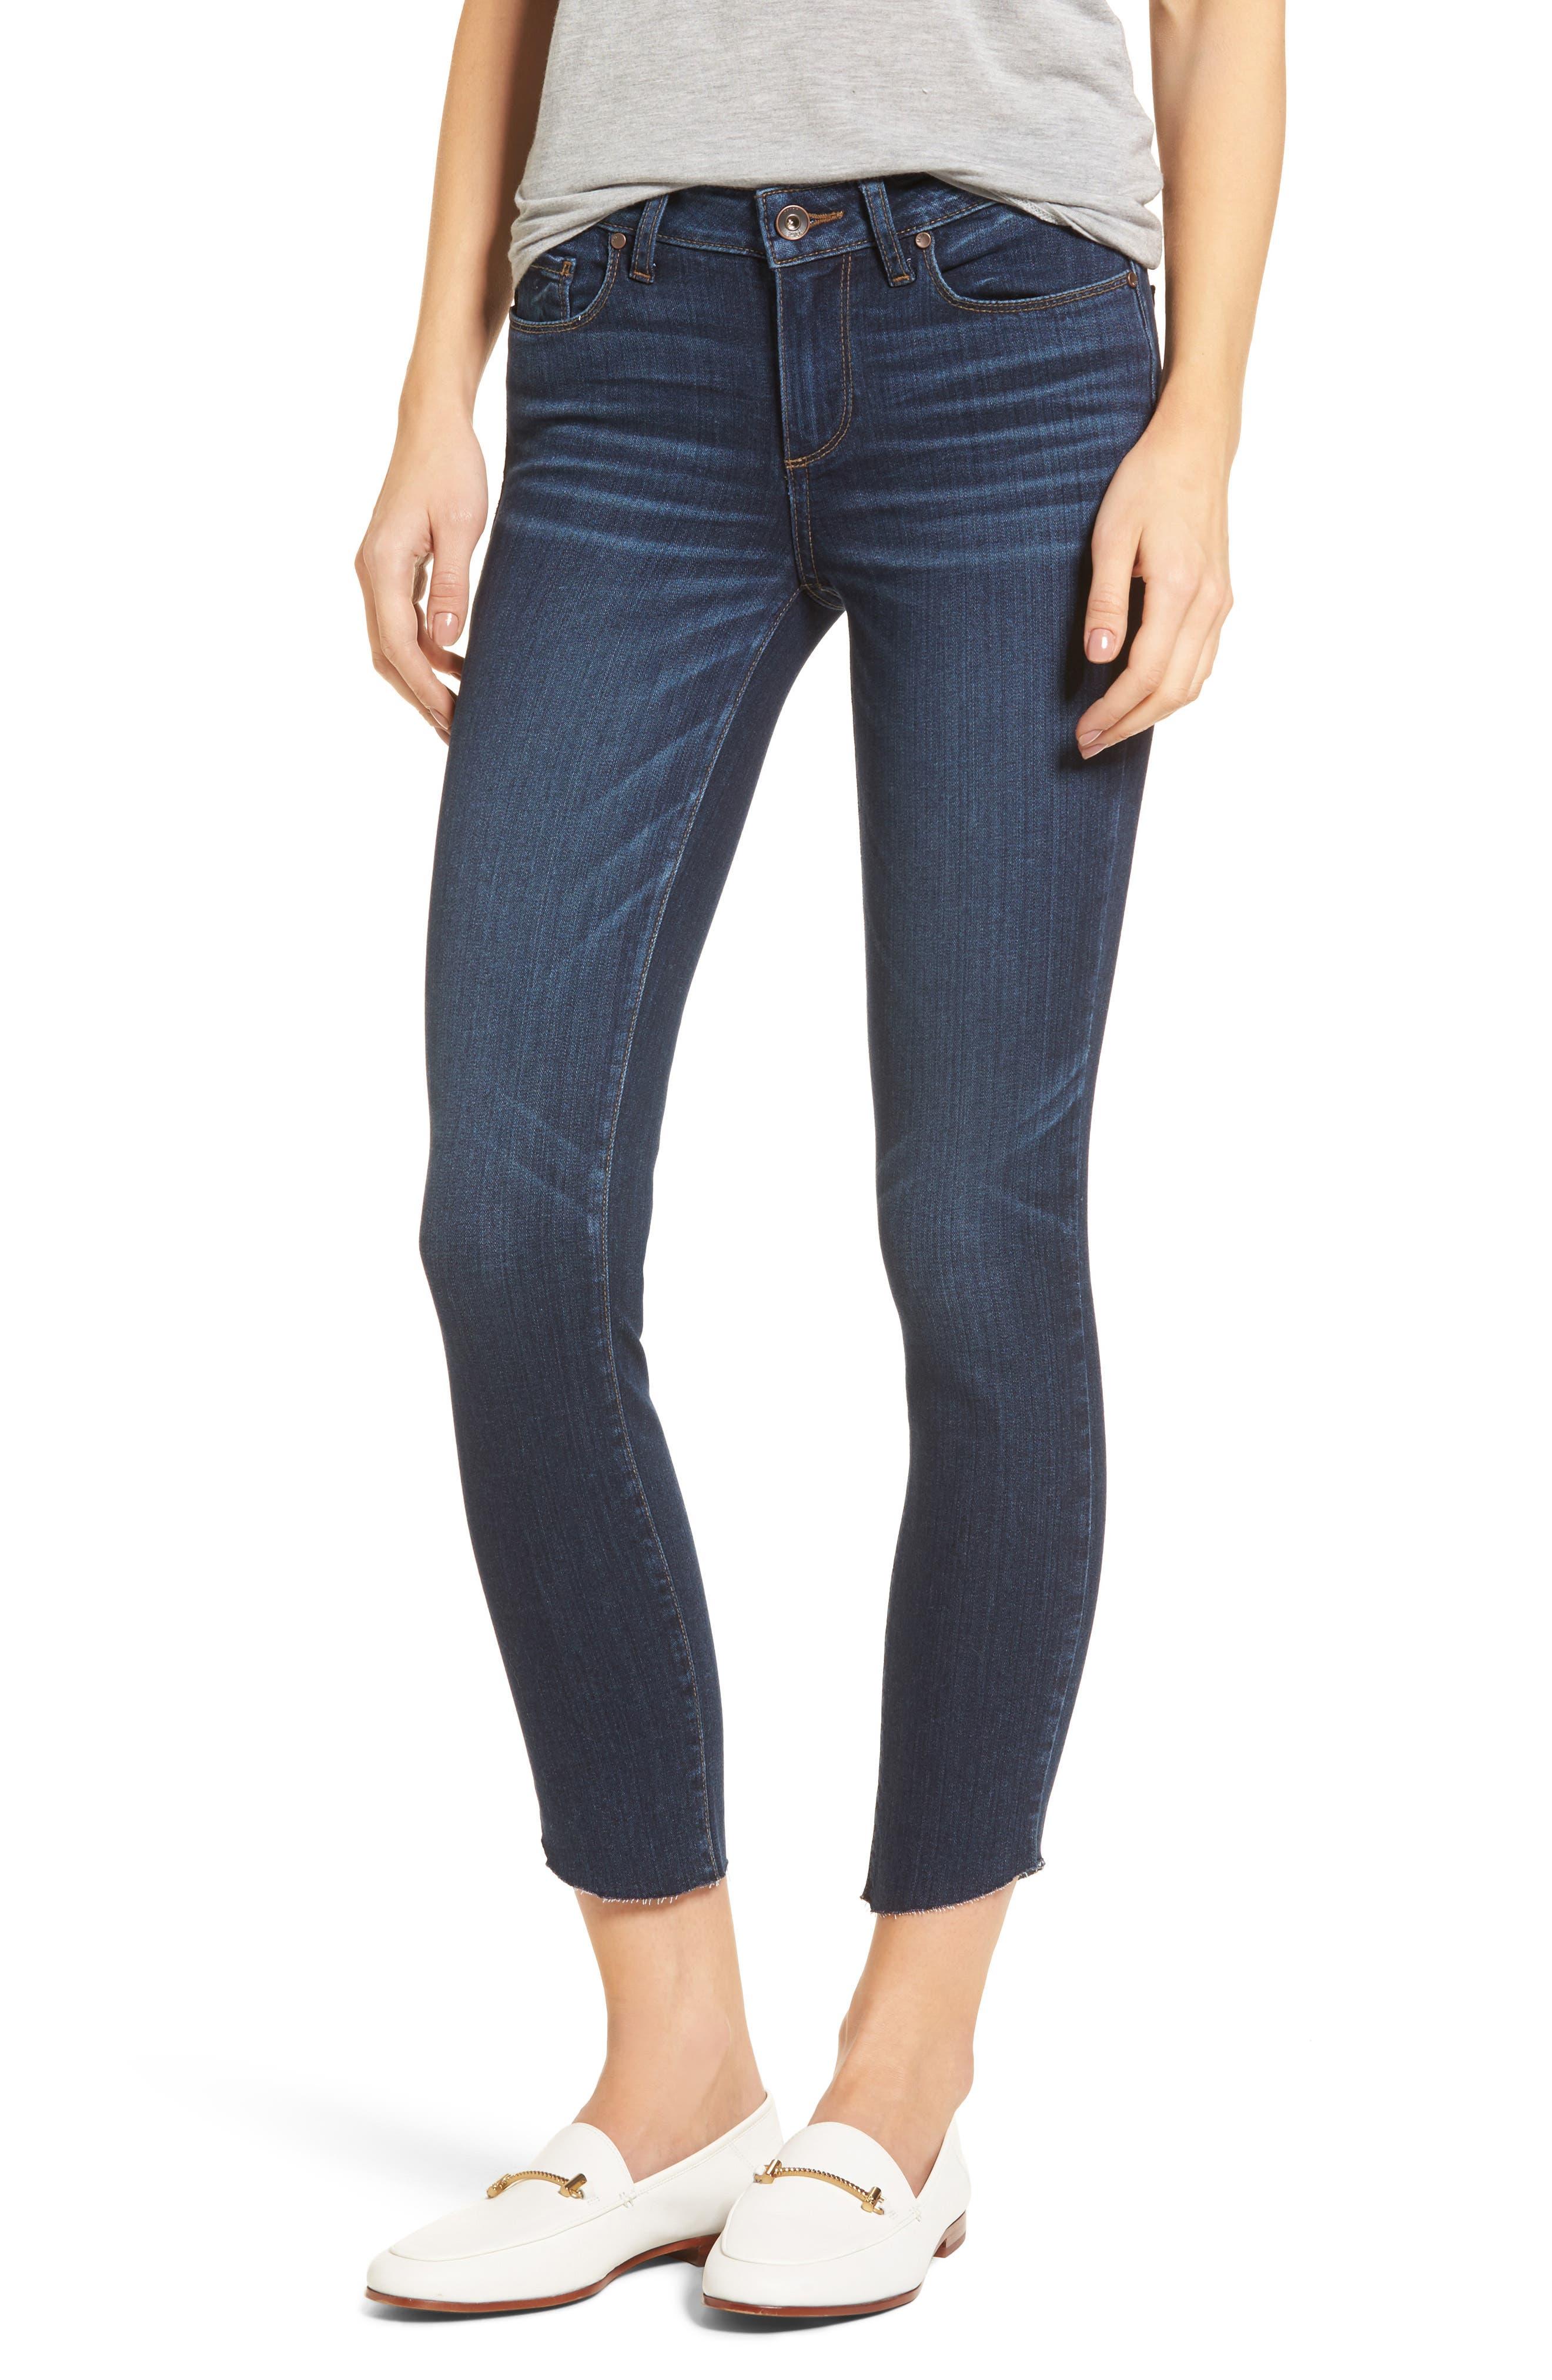 Transcend - Verdugo Ankle Ultra Skinny Jeans,                         Main,                         color, Oaklyn